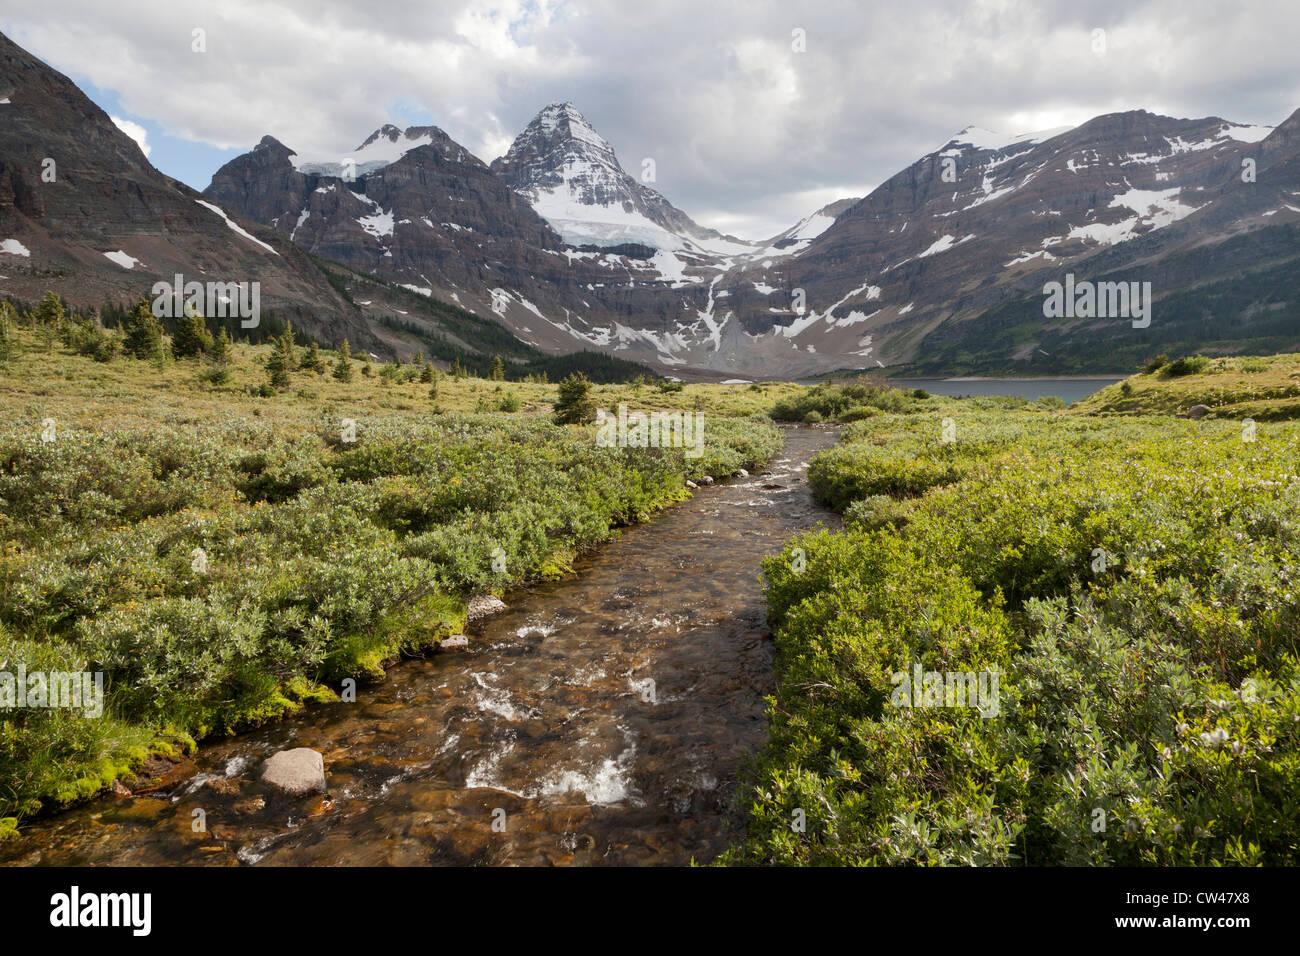 Canada, Mount Assiniboine Provincial Park, Mt. Assiniboine, Magog Creek and Lake, Mt. Magog and Mt. Strom Stock Photo